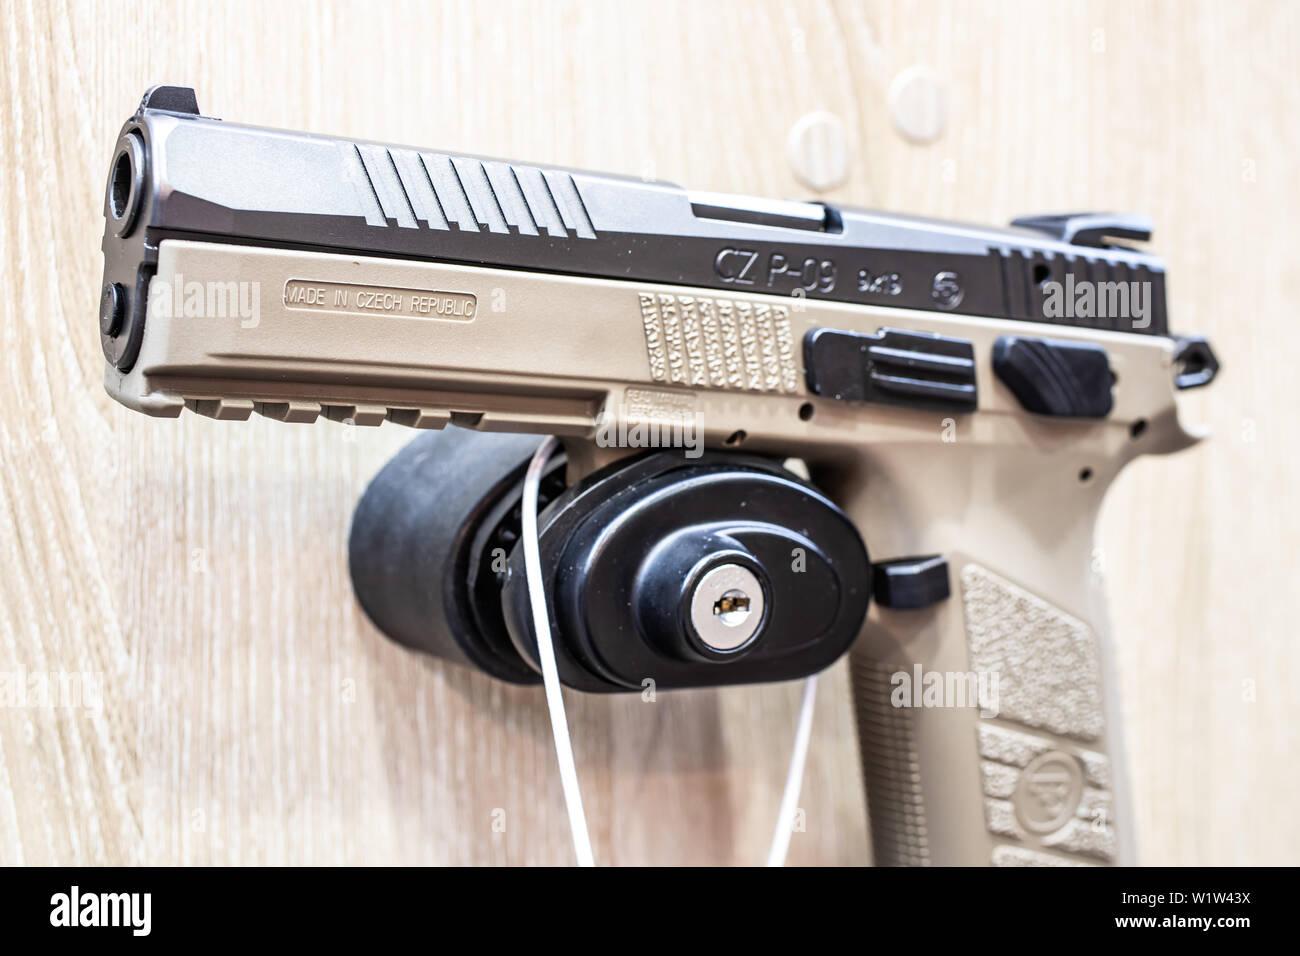 Poznan, Poland, Feb 2019 CZ semi-automatic pistol made by Czech firearm manufacturer CZUB in Czech Republic, exposition, KNIEJE Hunting shooting fair Stock Photo